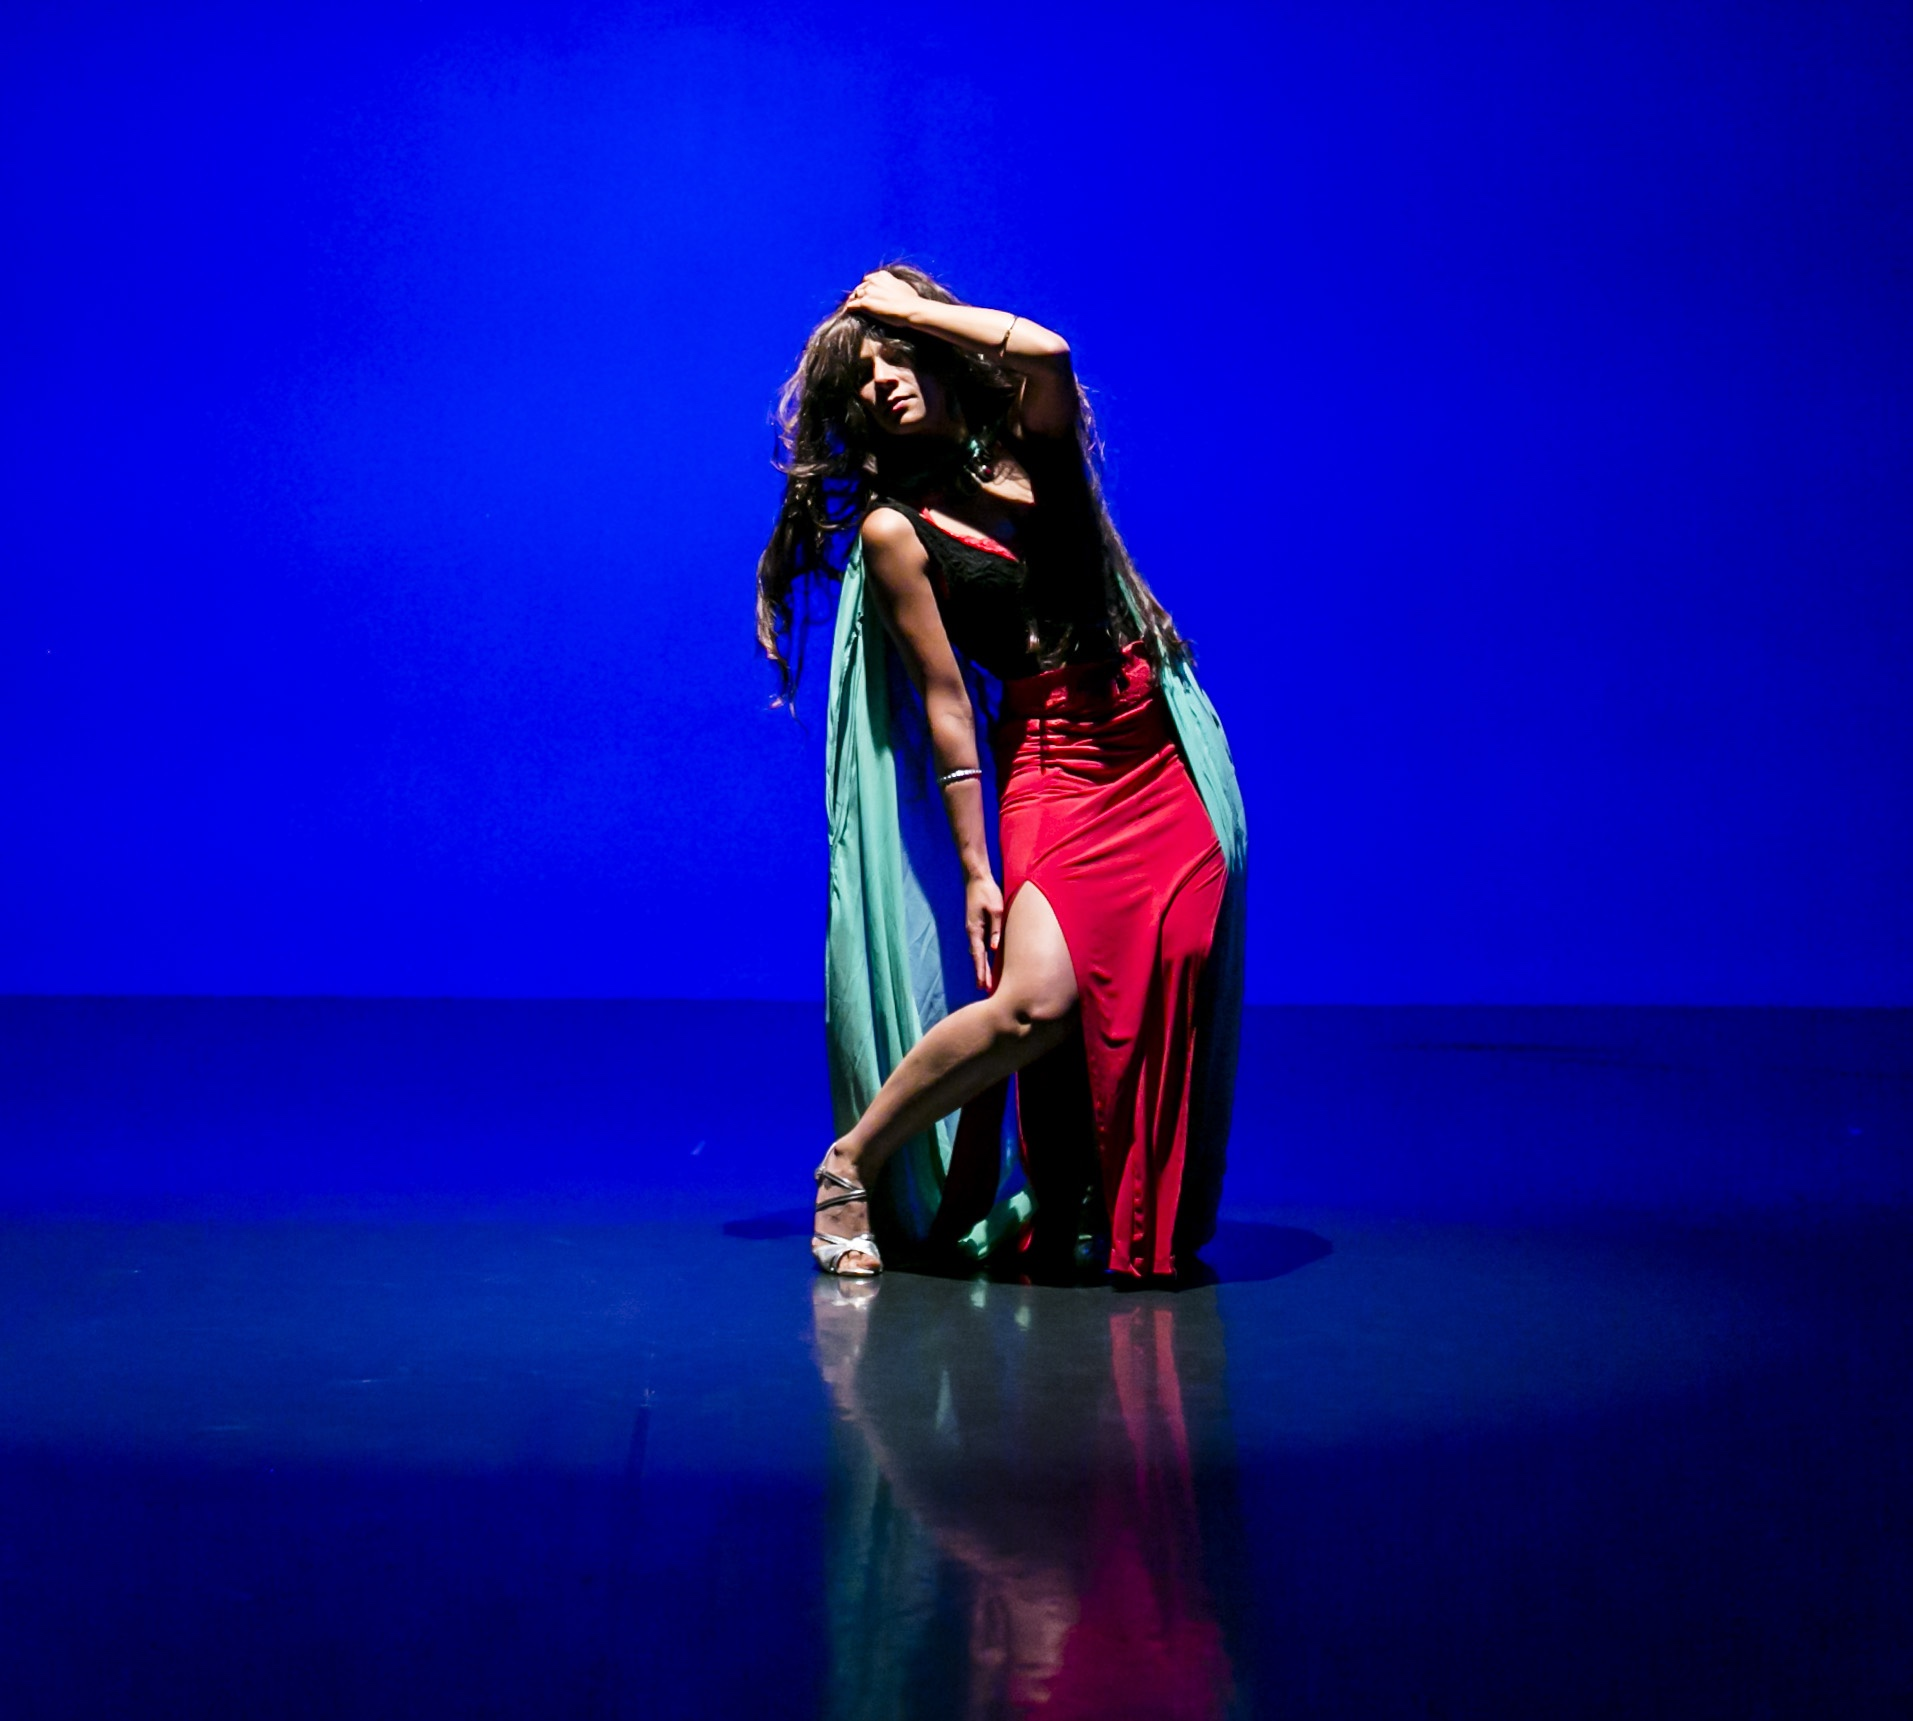 SELMADANCE: EMERGE DANCING